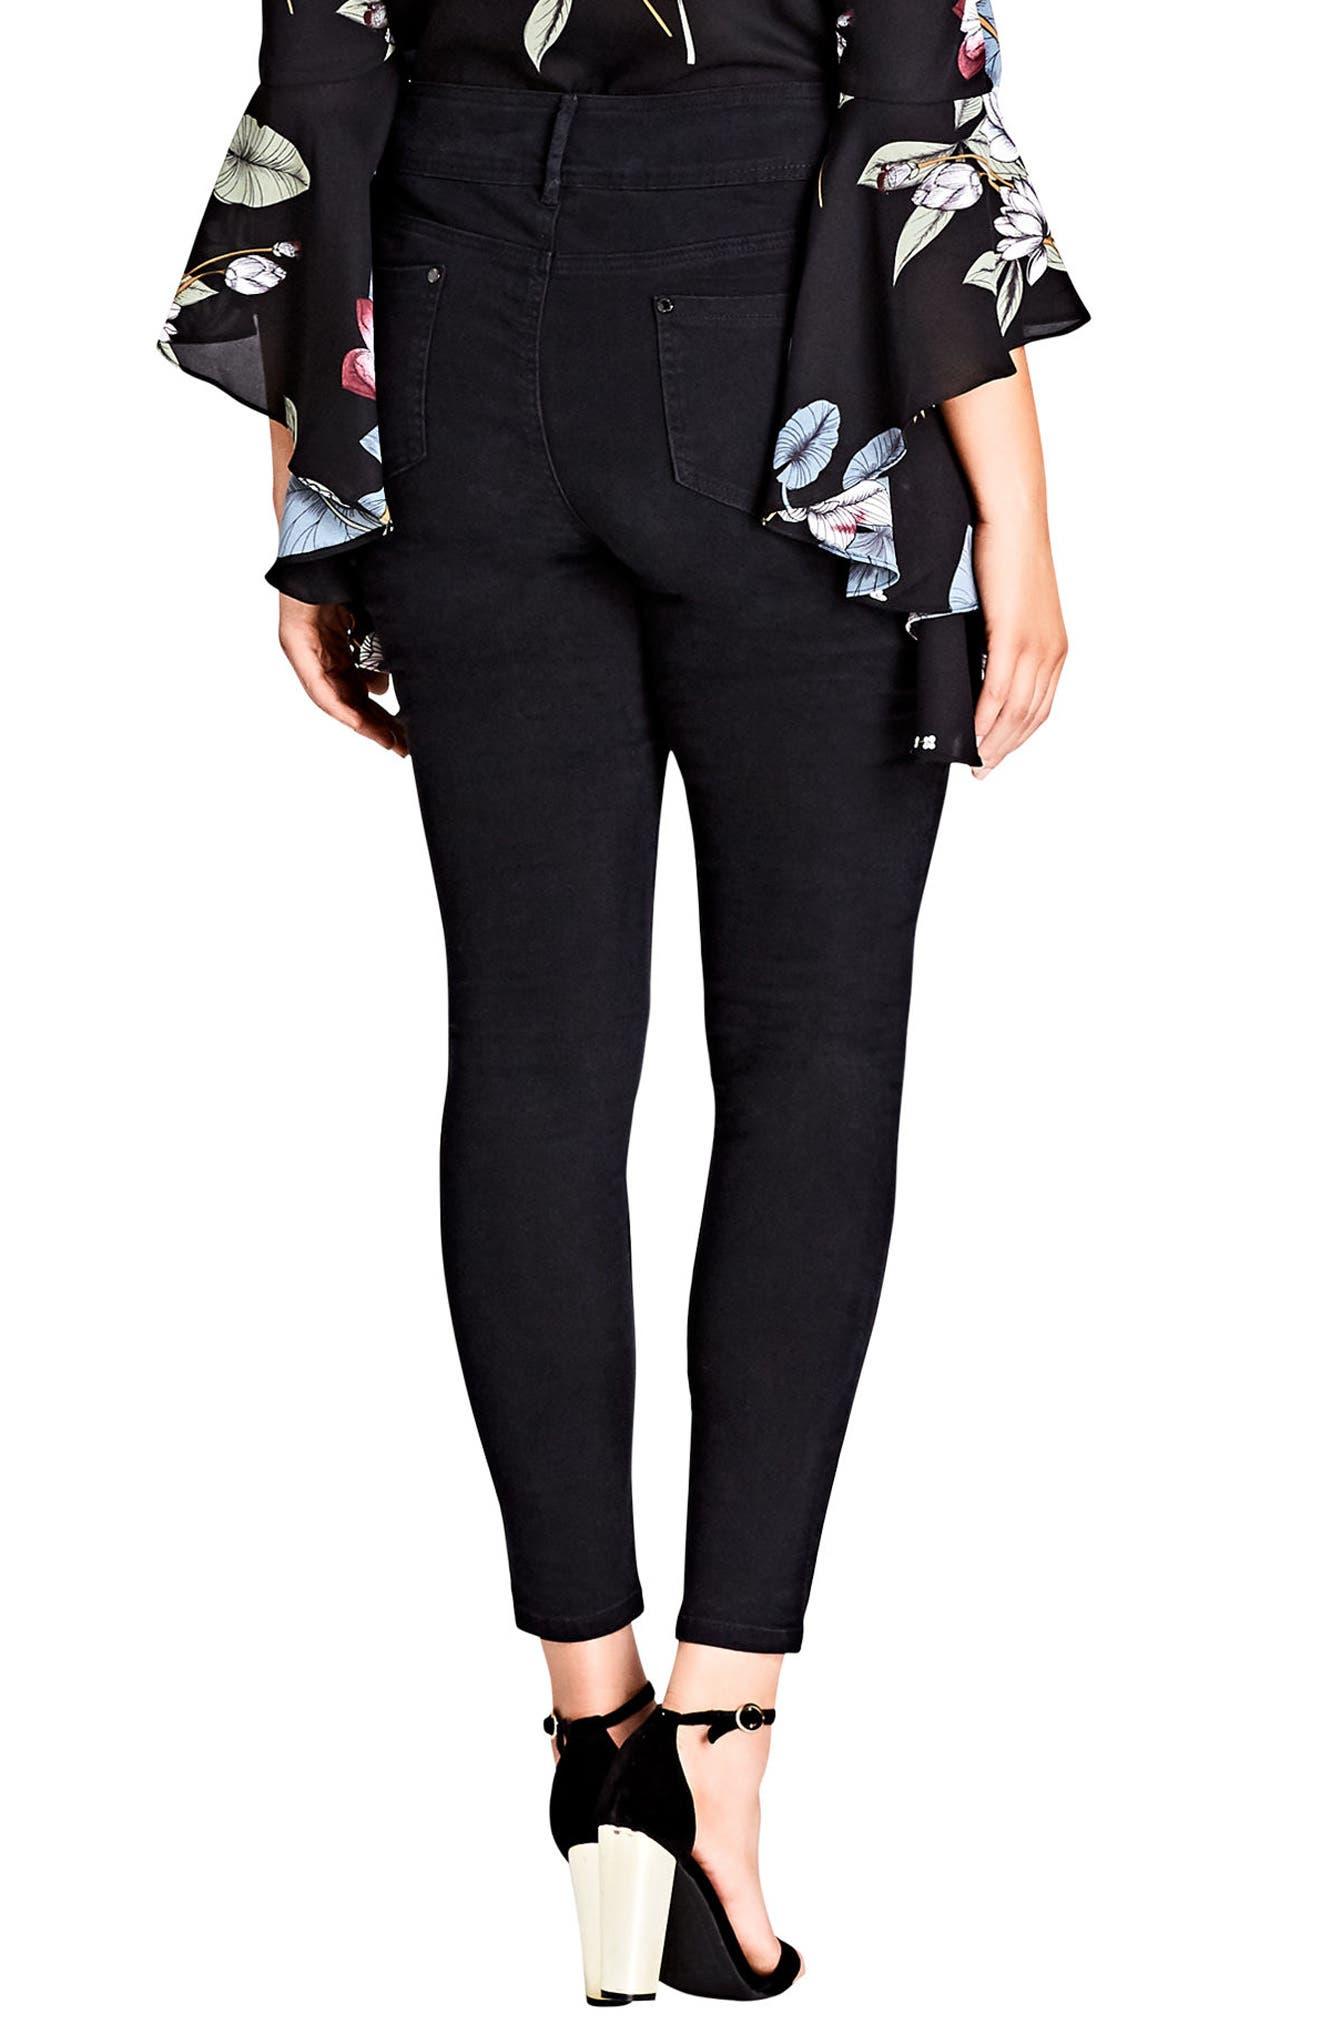 Asha Ripped Skinny Jeans,                             Alternate thumbnail 2, color,                             001